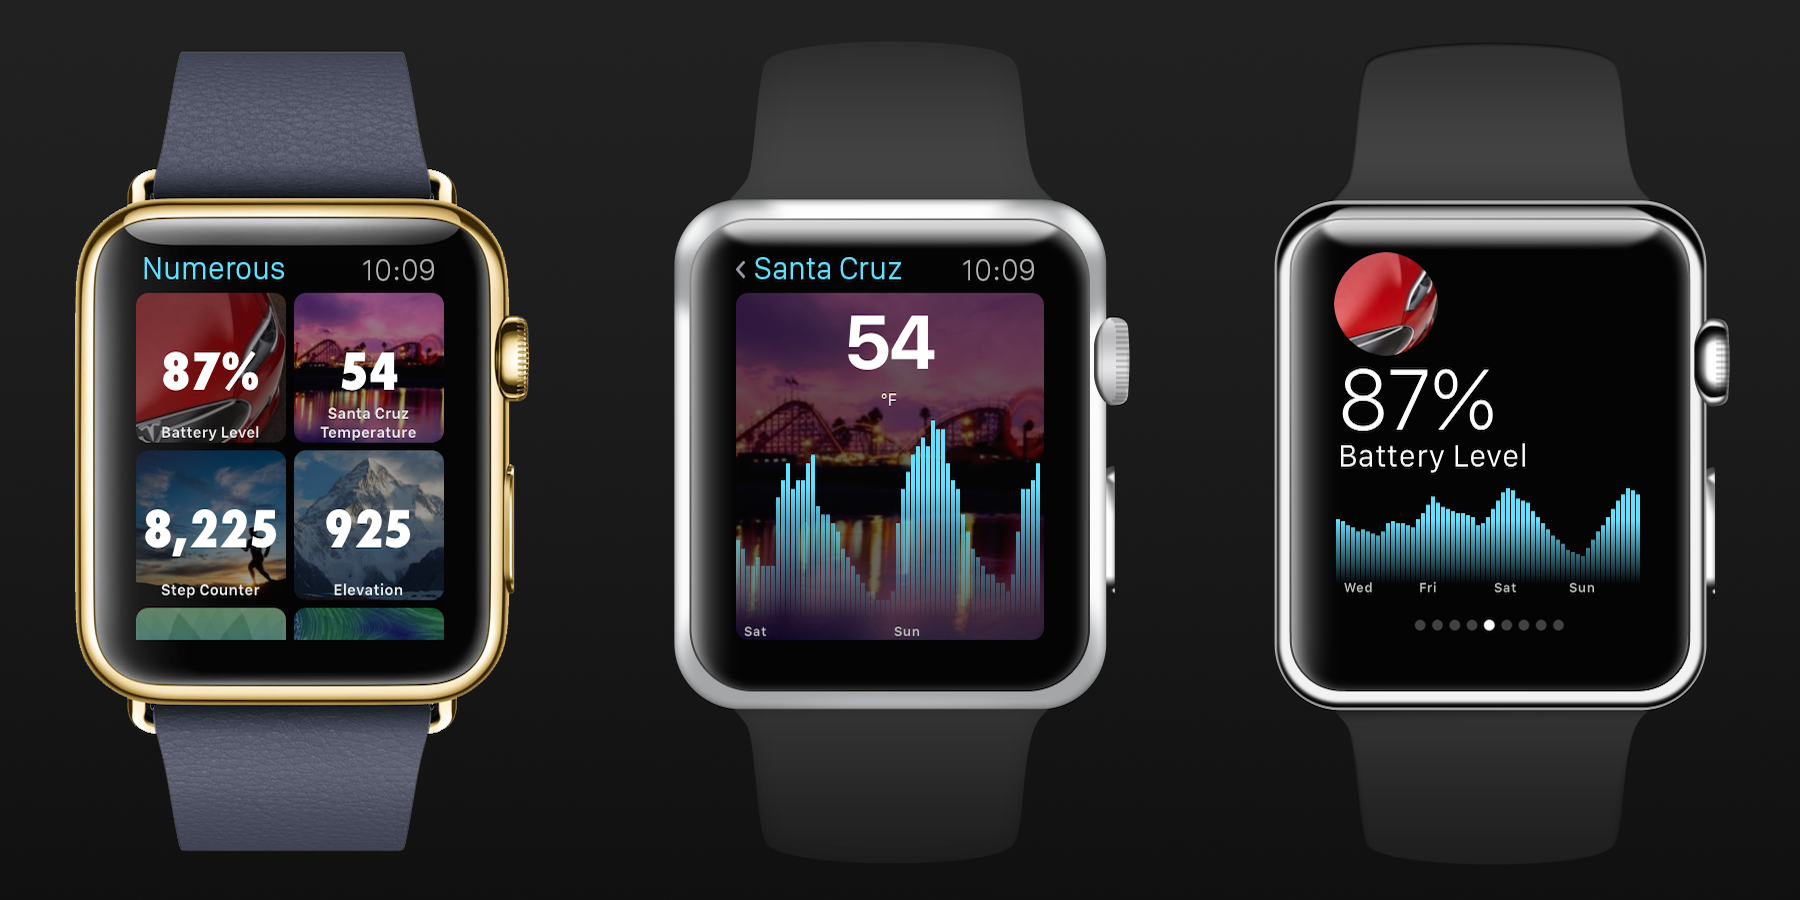 Numerous Apple Watch I